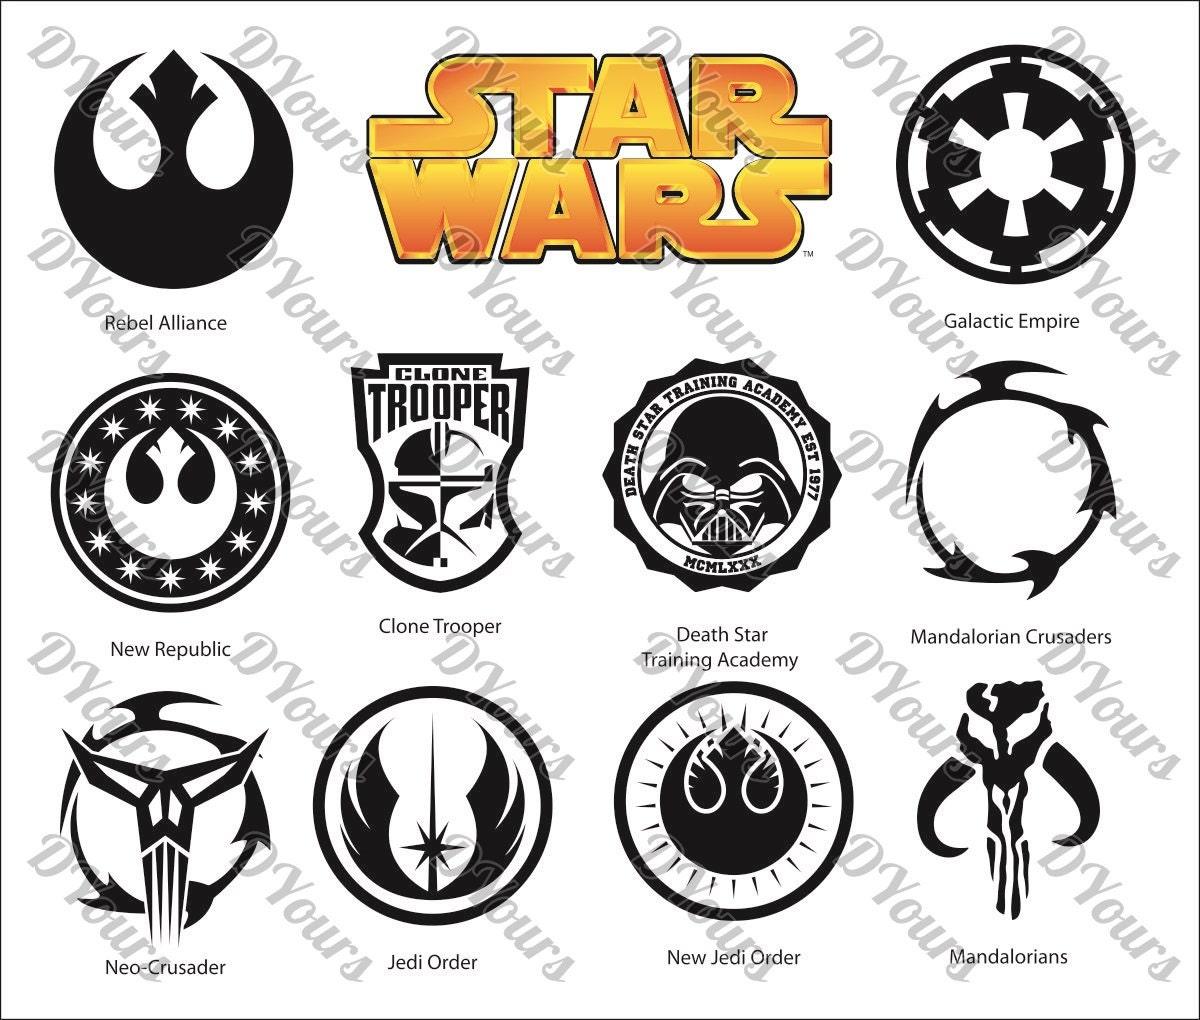 star wars symbols clipart 11 vector models vector collection svg cdr ai pdf eps files. Black Bedroom Furniture Sets. Home Design Ideas